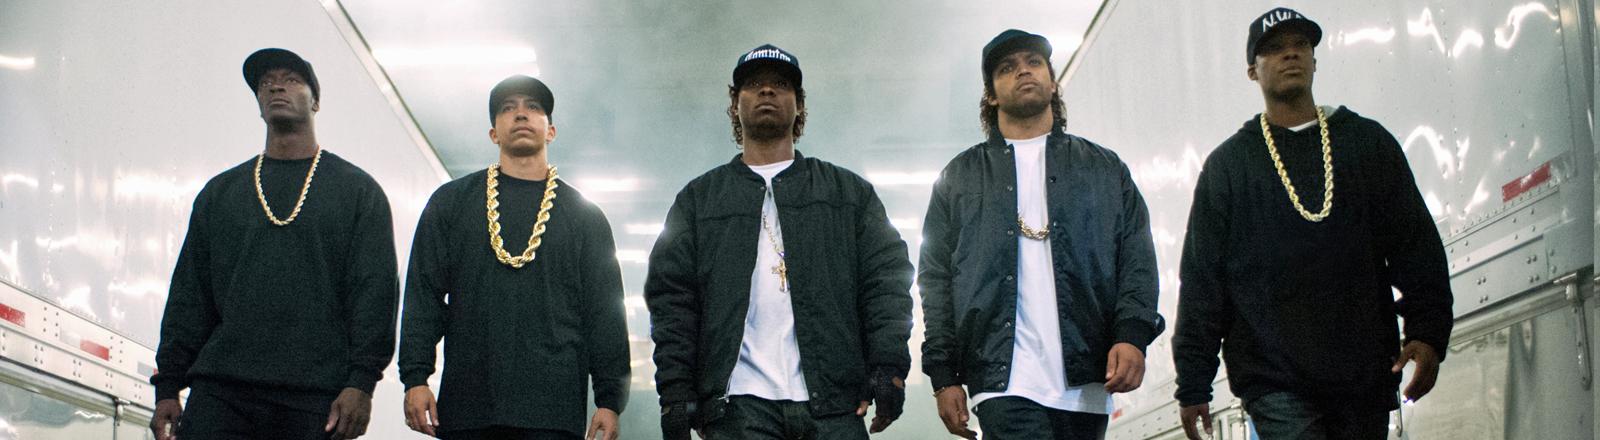 "Aldis Hodge als MC Ren, Neil Brown Jr. als DJ Yella, Jason Mitchell als Eazy-E, O'Shea Jackson Jr. als Ice Cube und Corey Hawkins als Dr. Dre in einer Szene des Kinofilms ""Straight Outta Compton""."